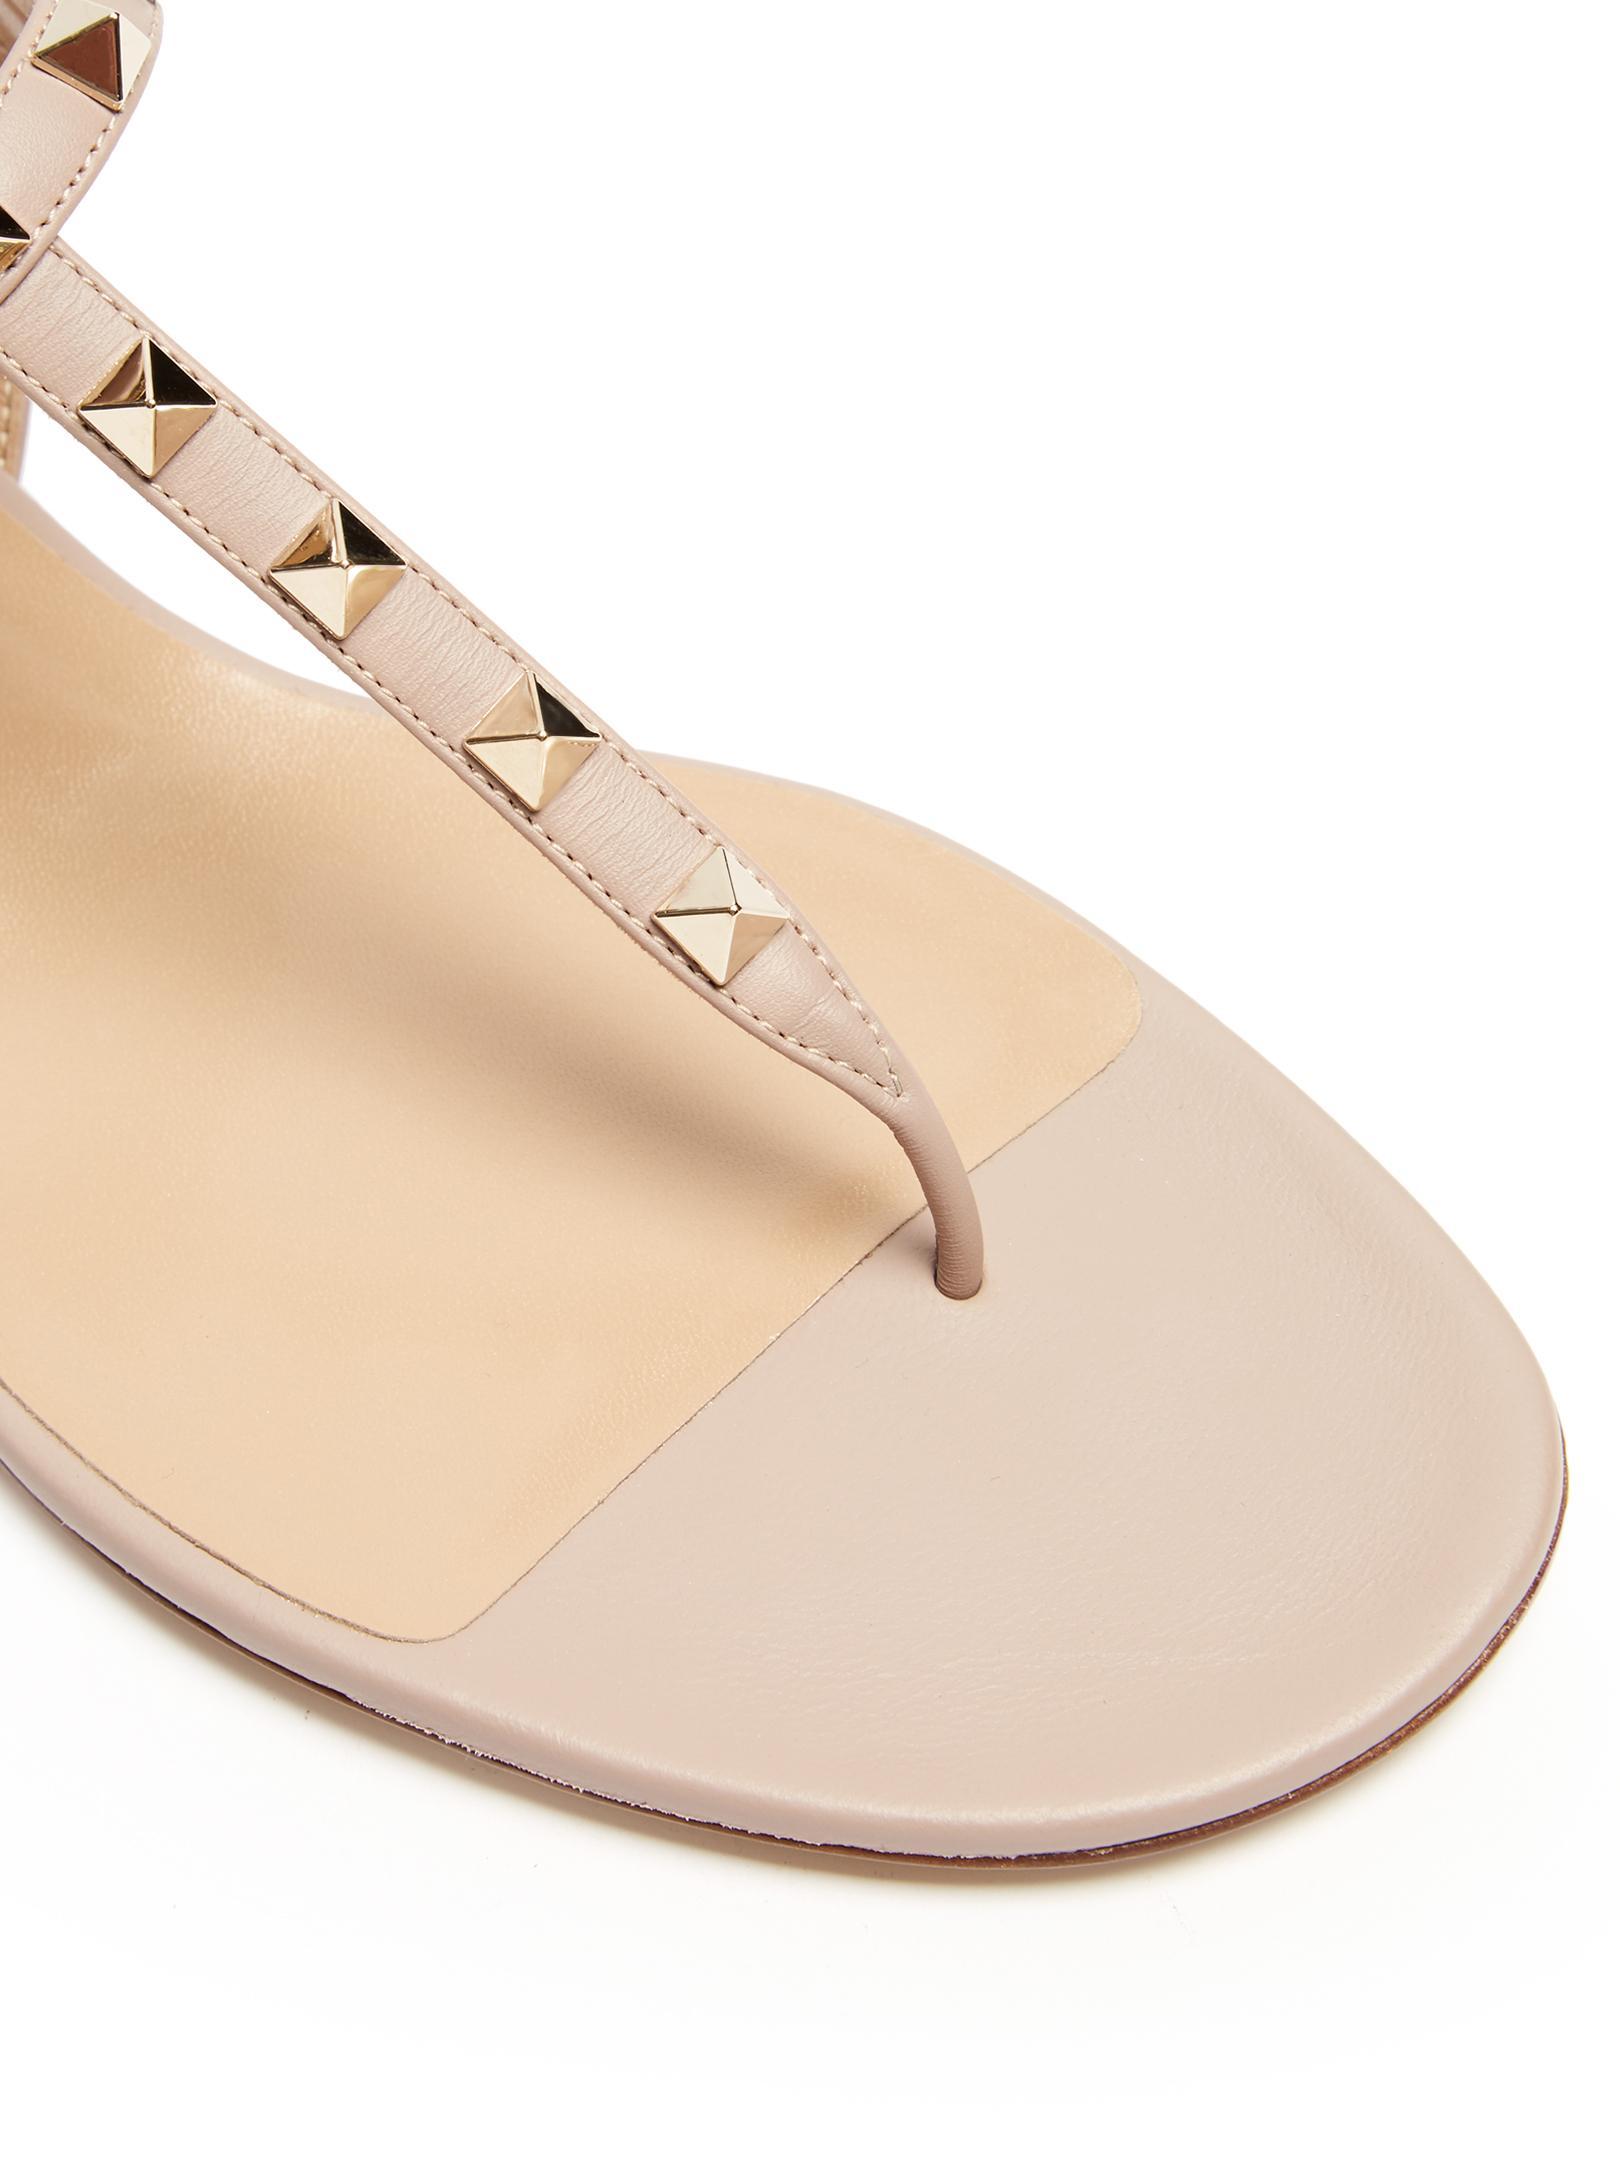 c65215e2de68b Lyst - Valentino Rockstud Flat Leather Sandals